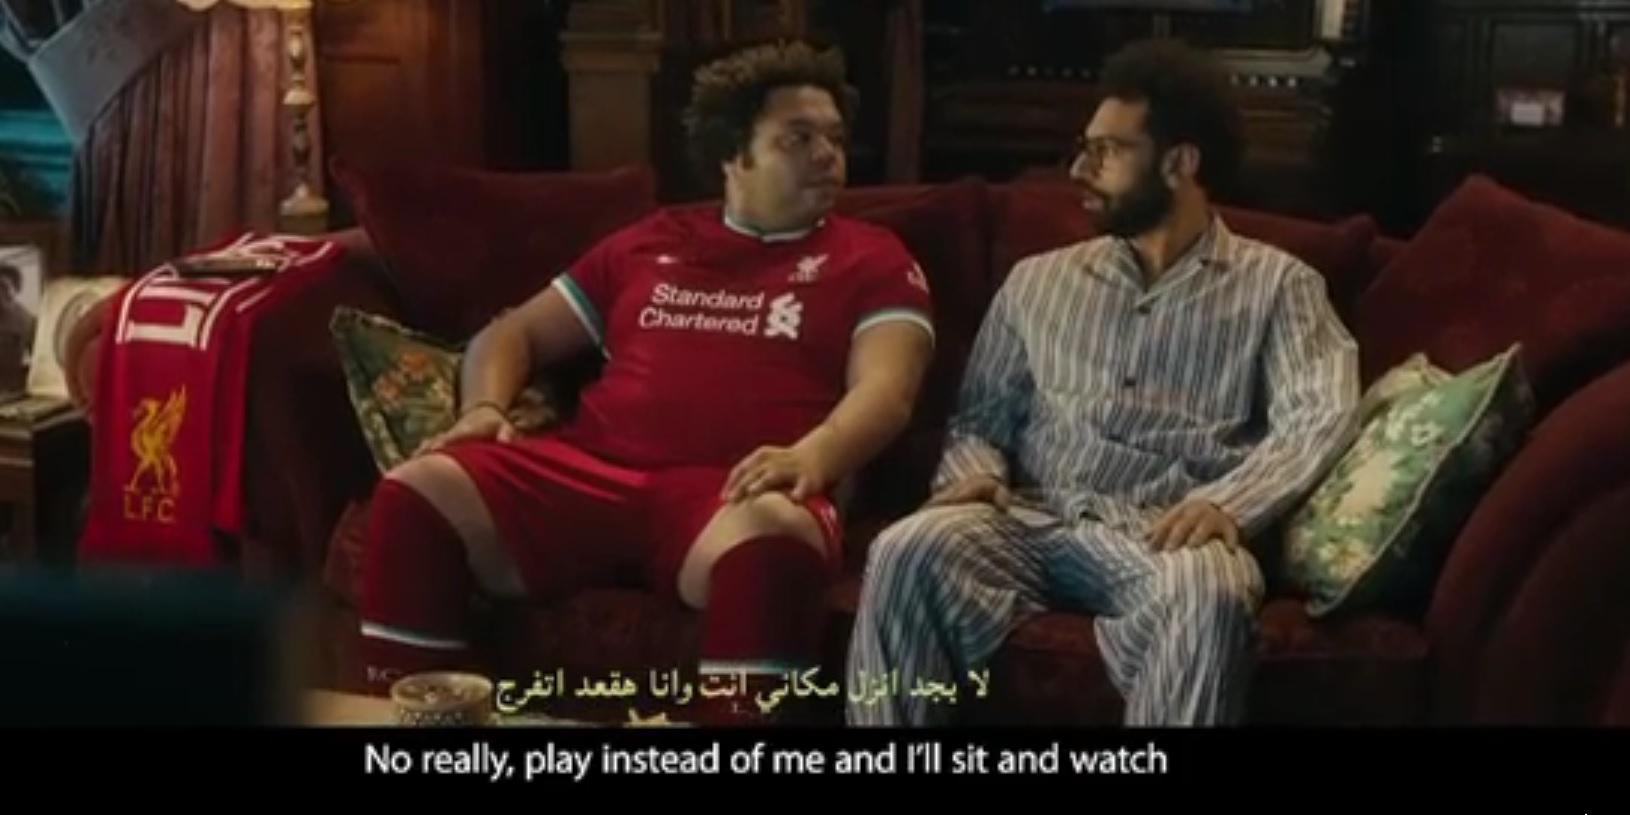 (Video) Salah stars in hilarious new ad poking fun at social media know-it-alls